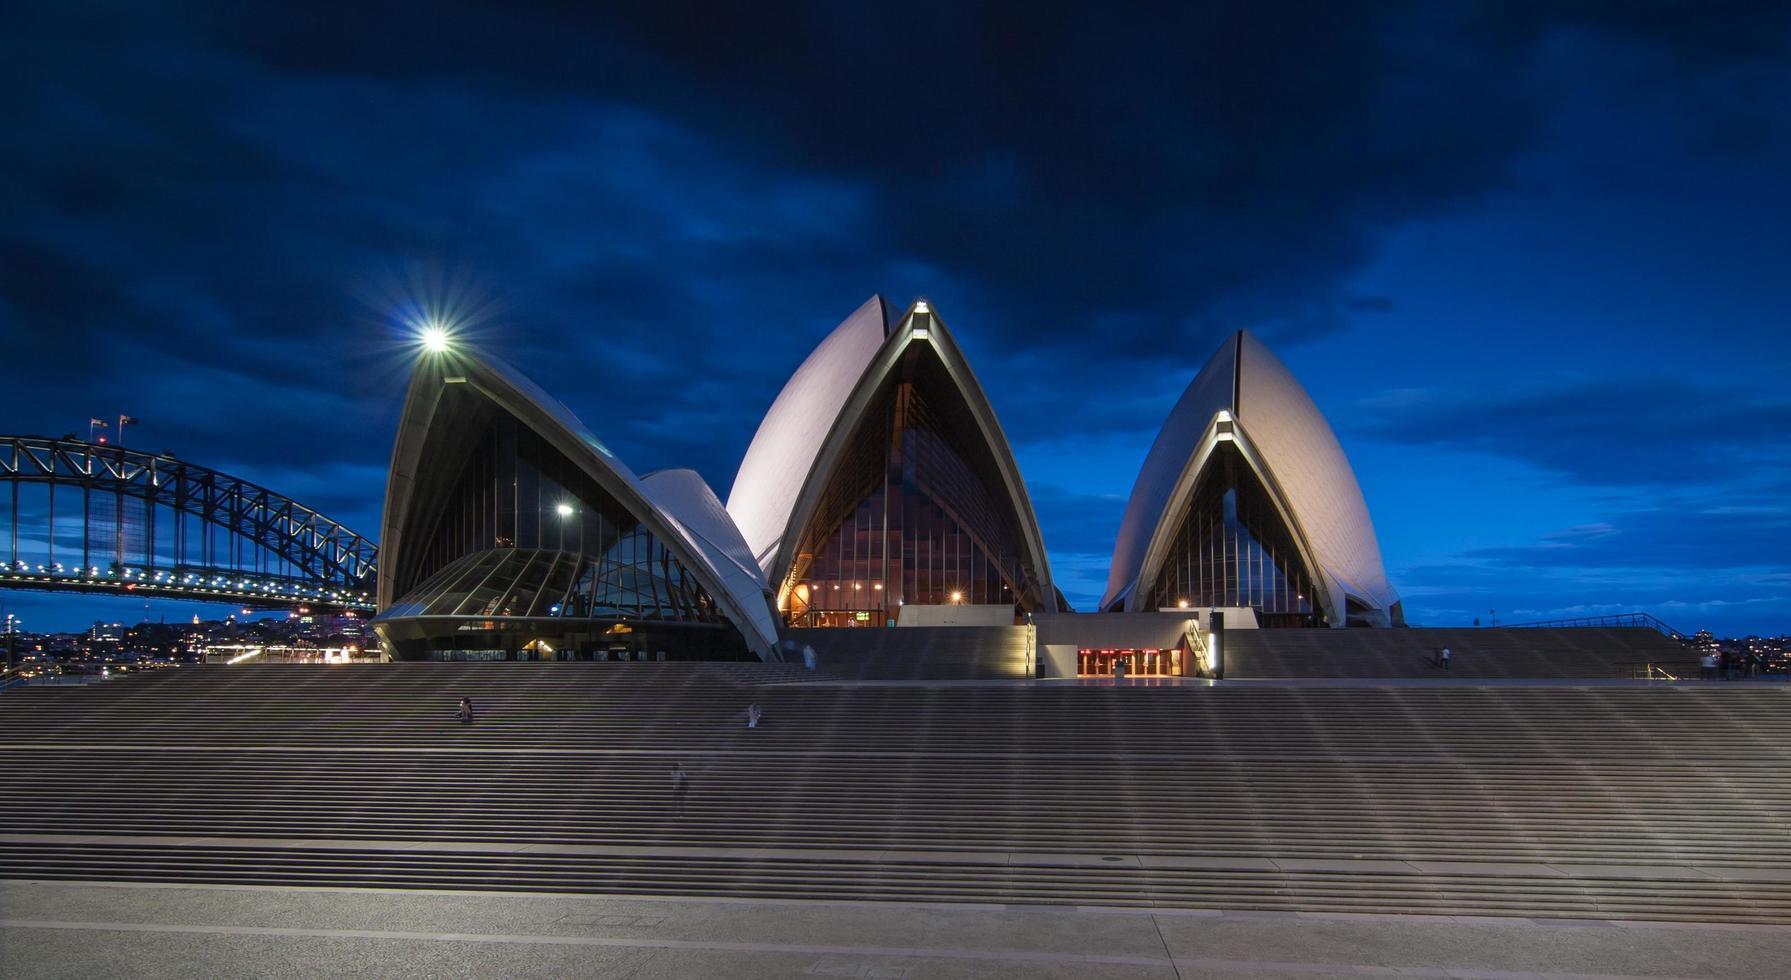 Sydney, Australia, 2020 - Long-exposure of the Sydney Opera House at night photo